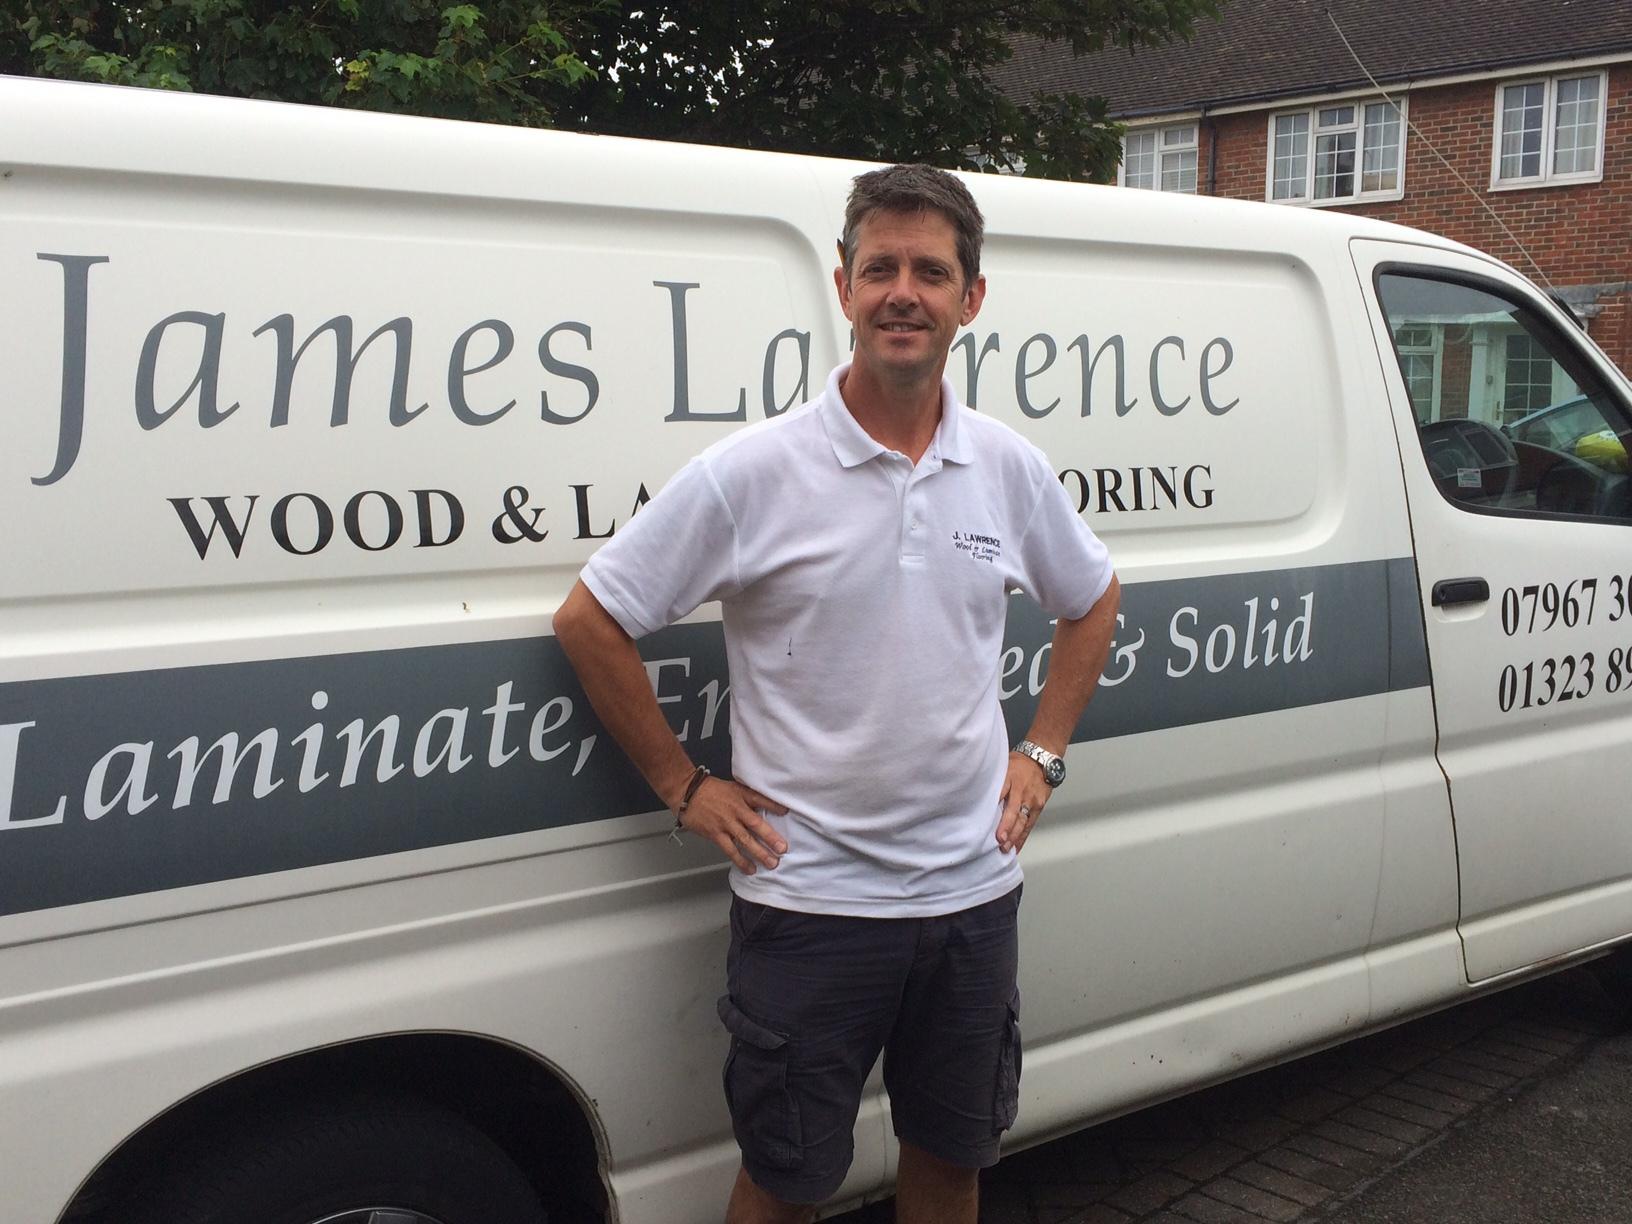 James Lawrence